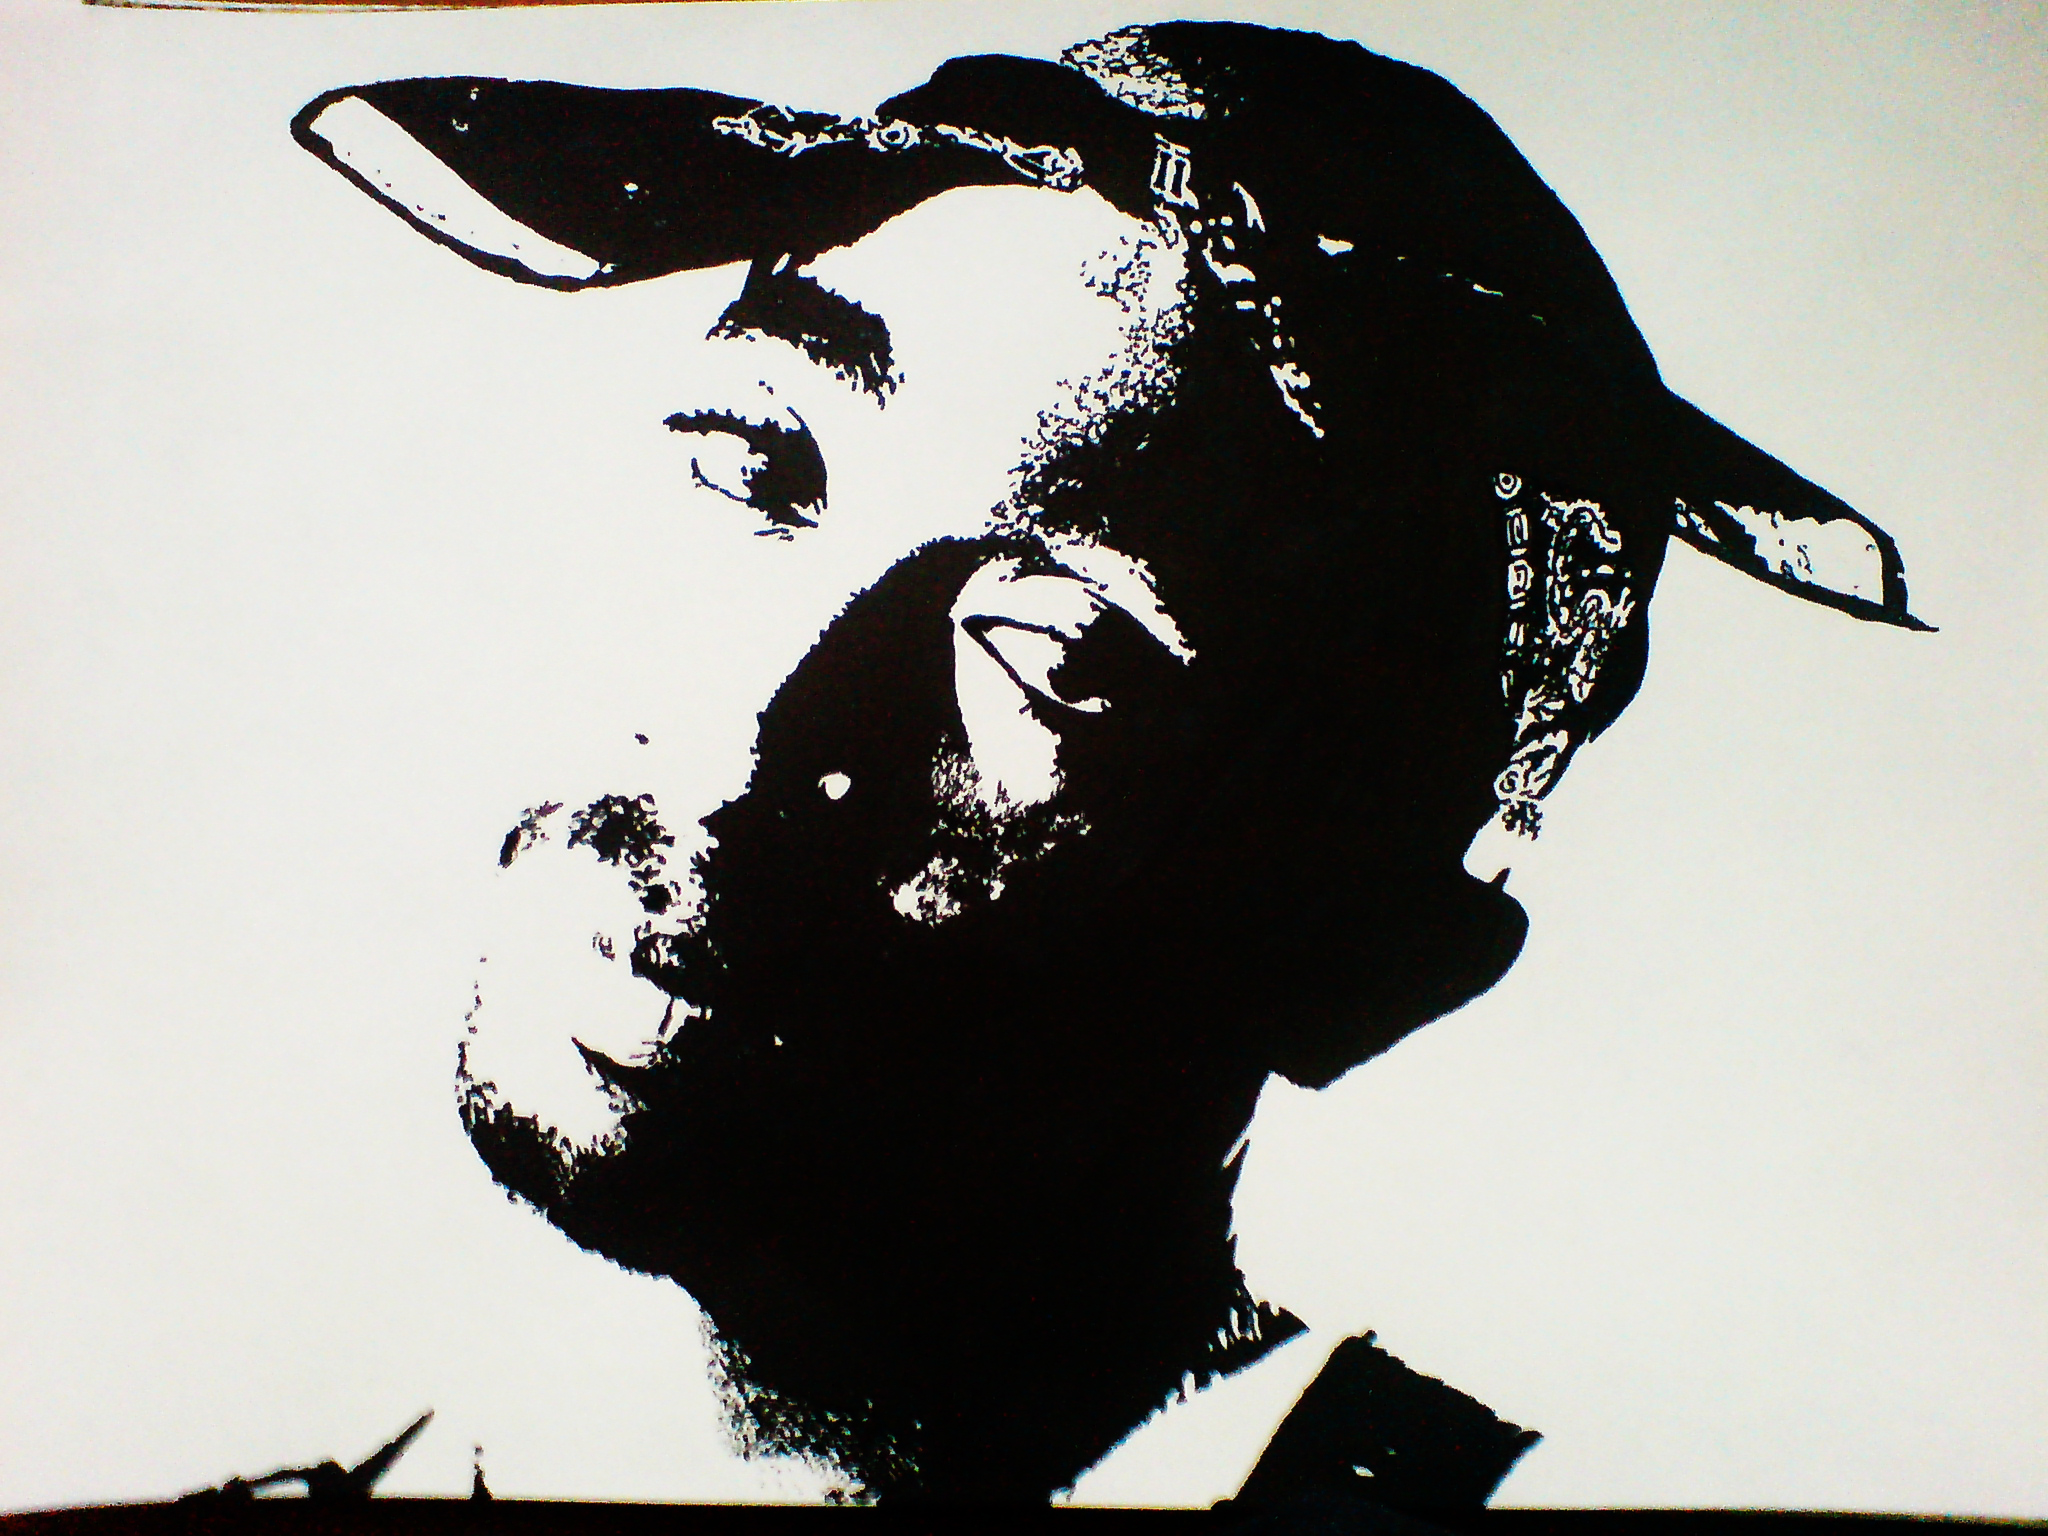 Tupac Artwork 46 By 00Makaveli00 On DeviantArt